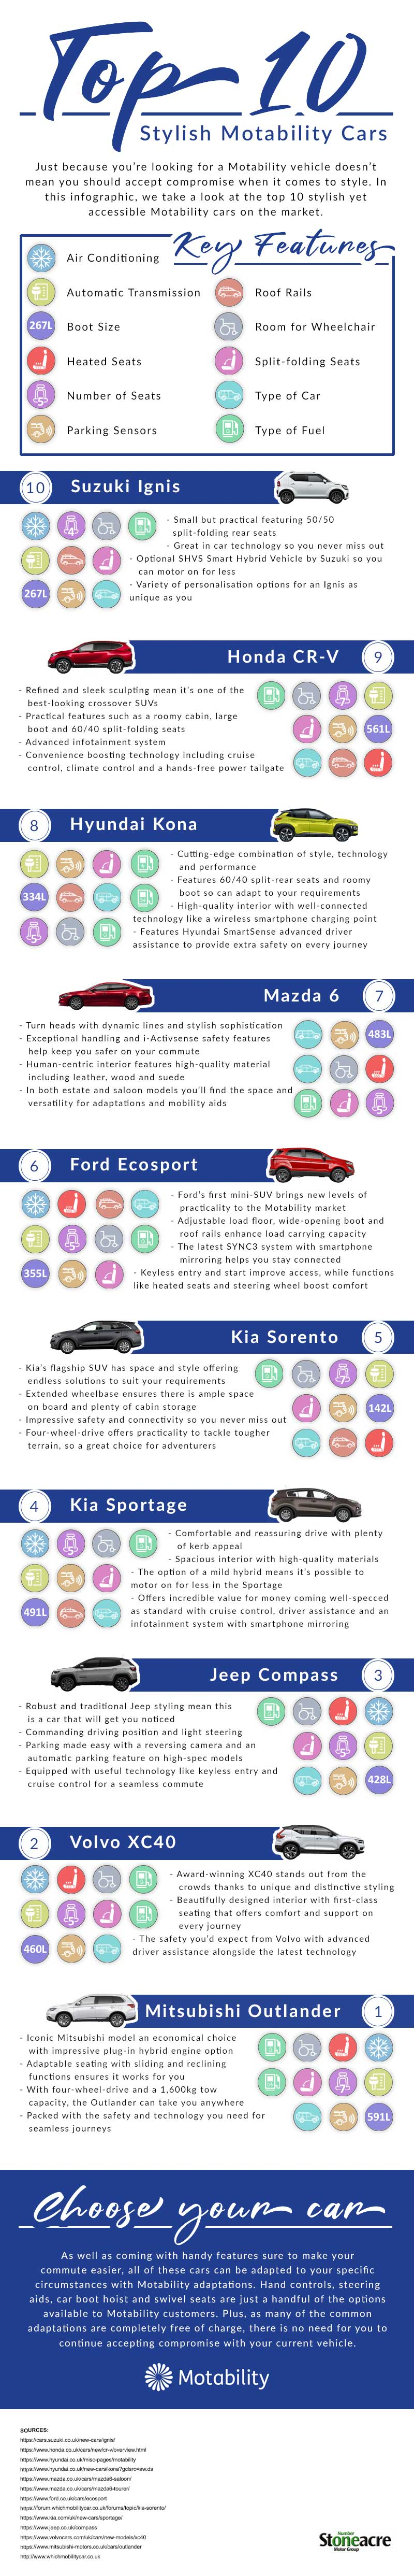 top ten stylish motability cars infographic